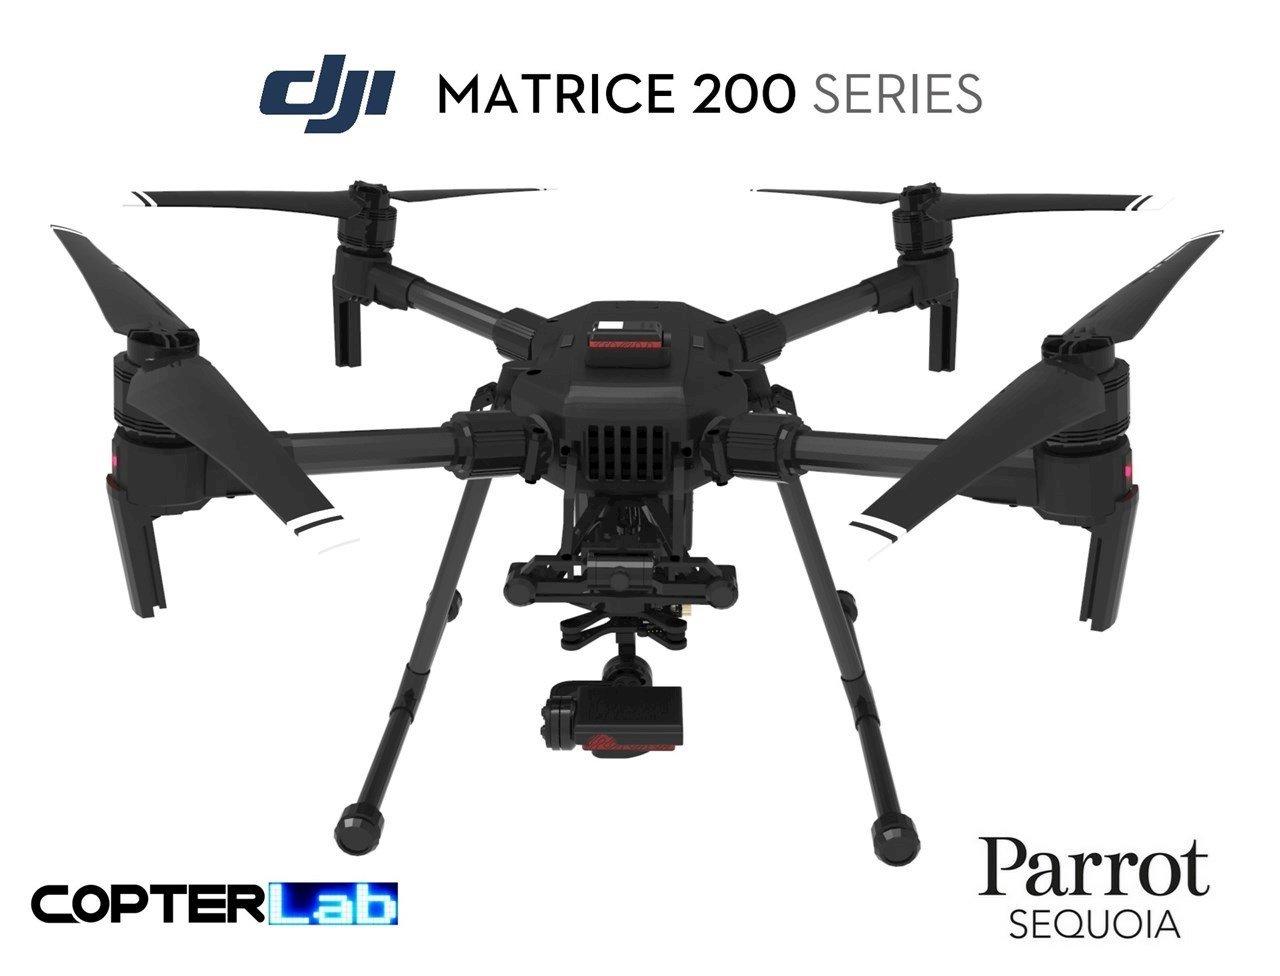 2 Axis Parrot Sequoia+Micro NDVI Skyport Gimbal for DJI Matrice 210 M210